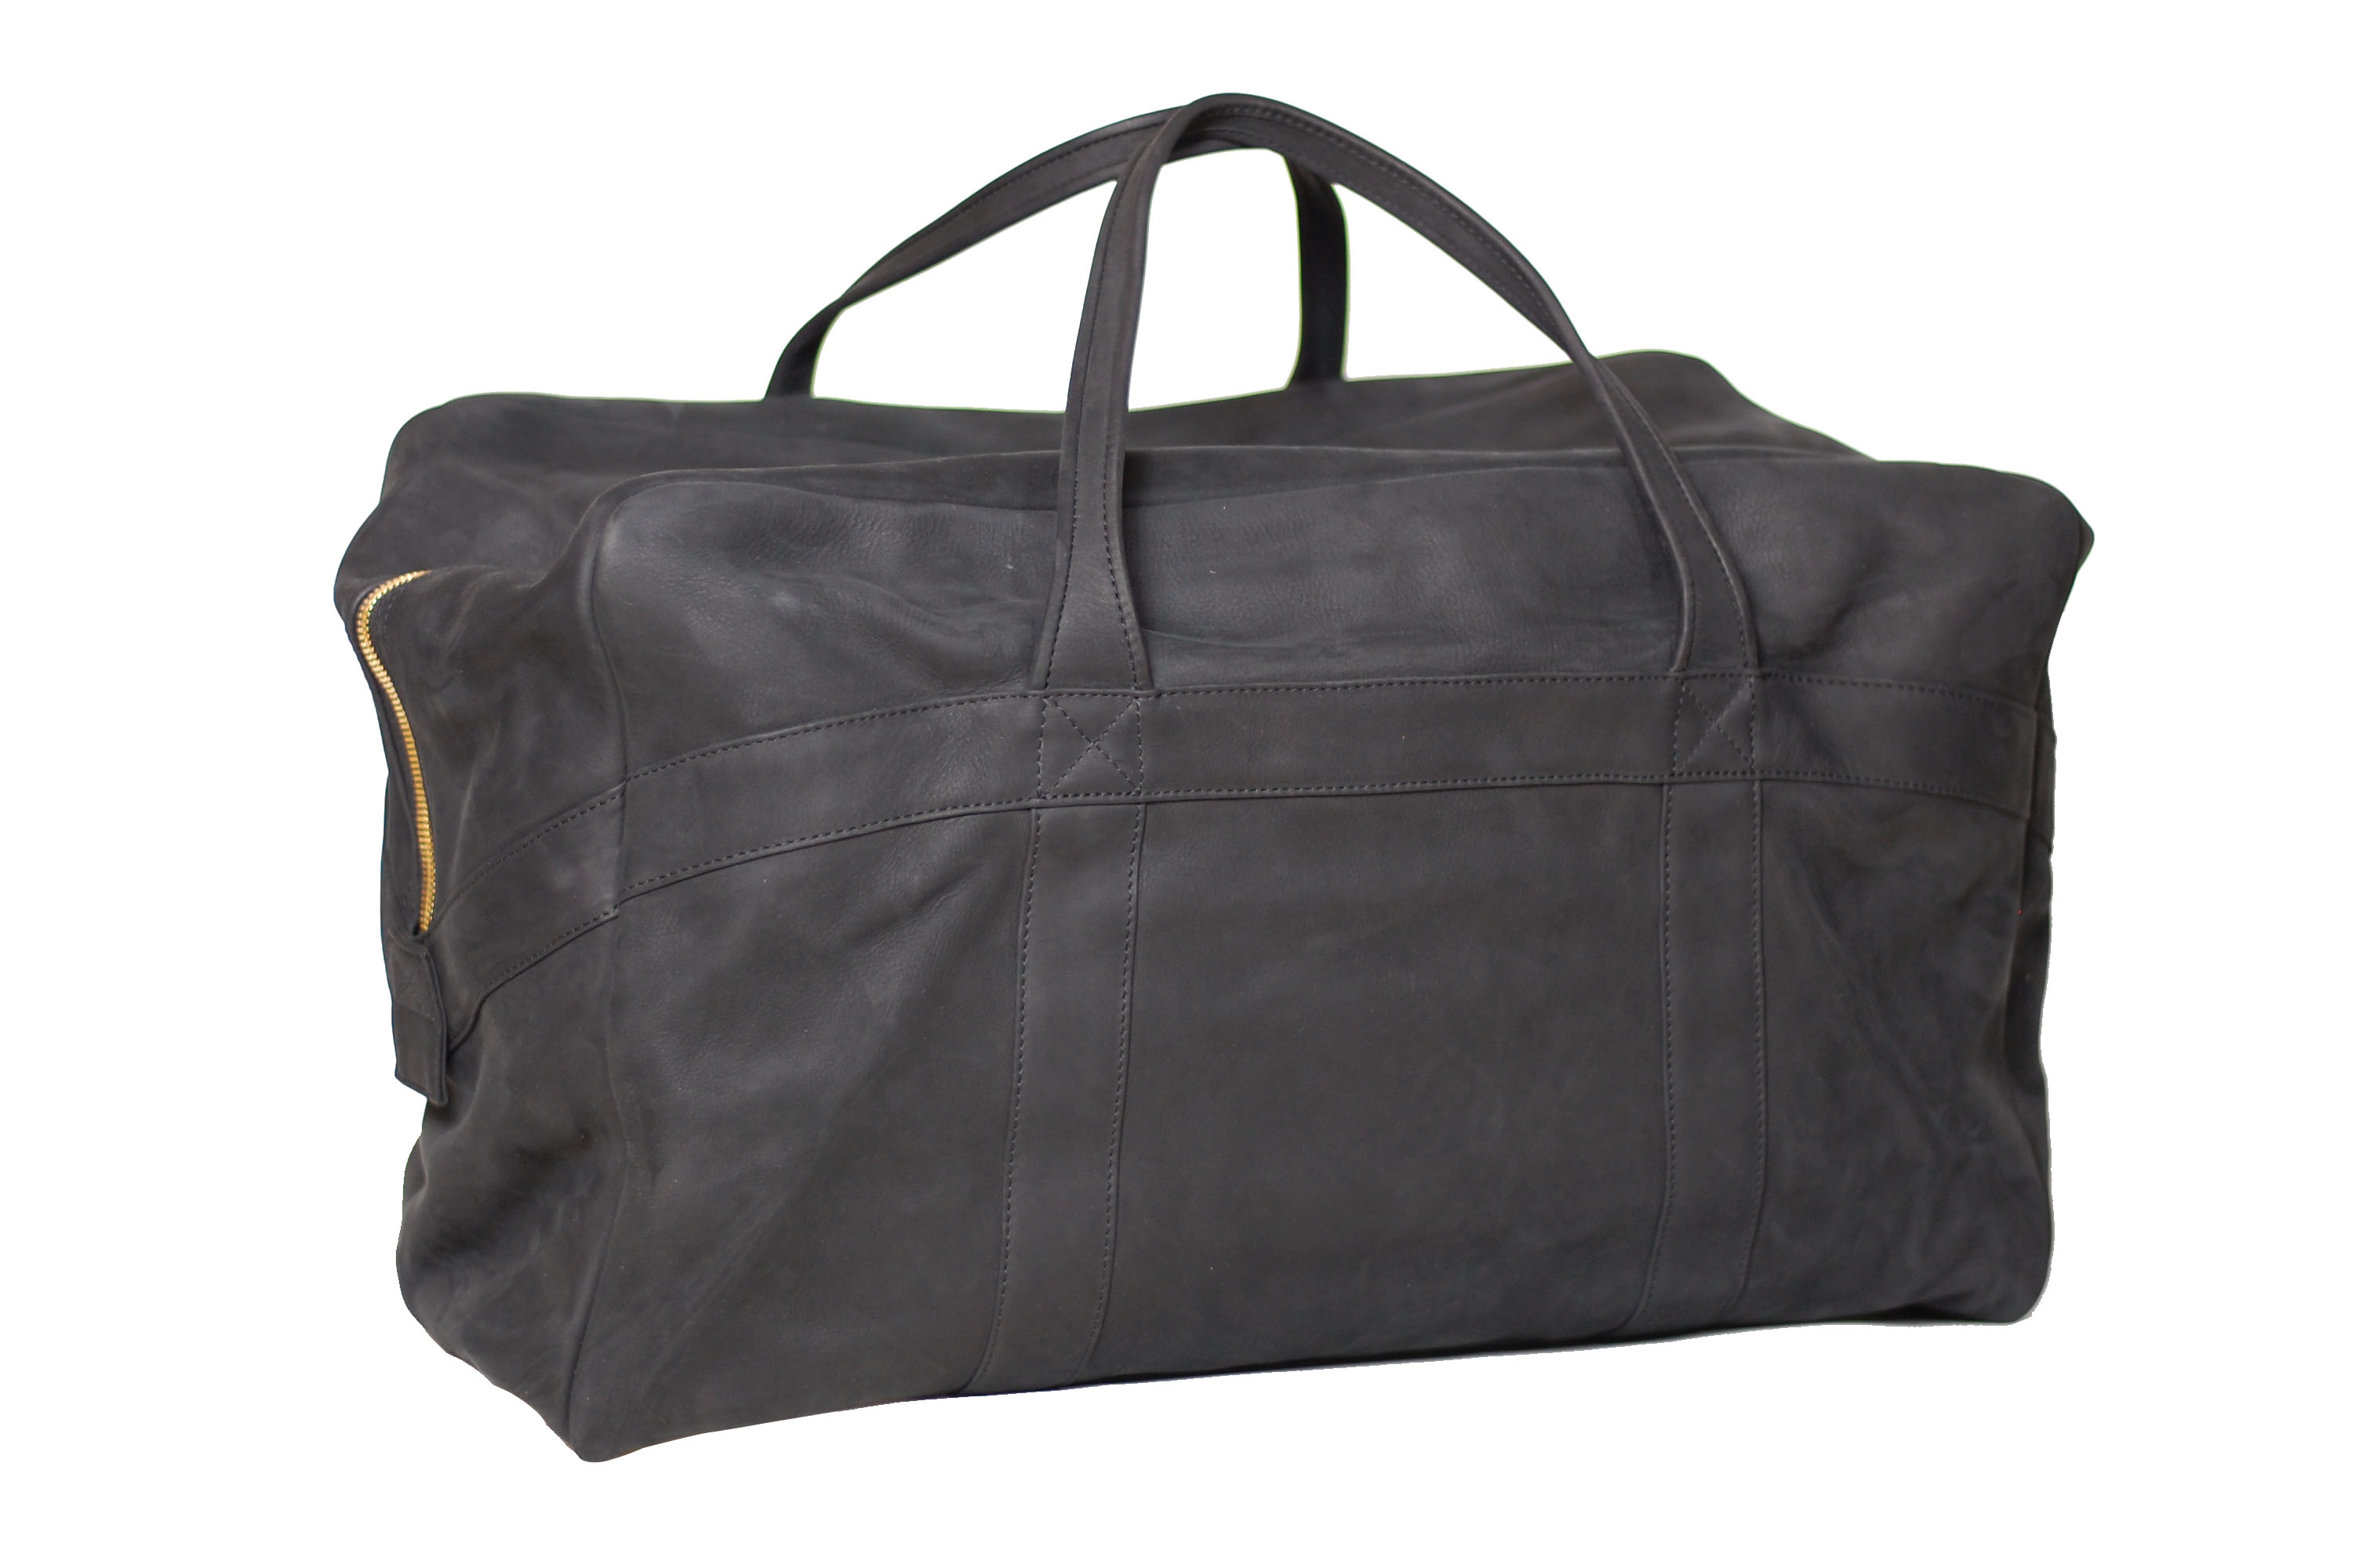 TAP TRAVEL BAG